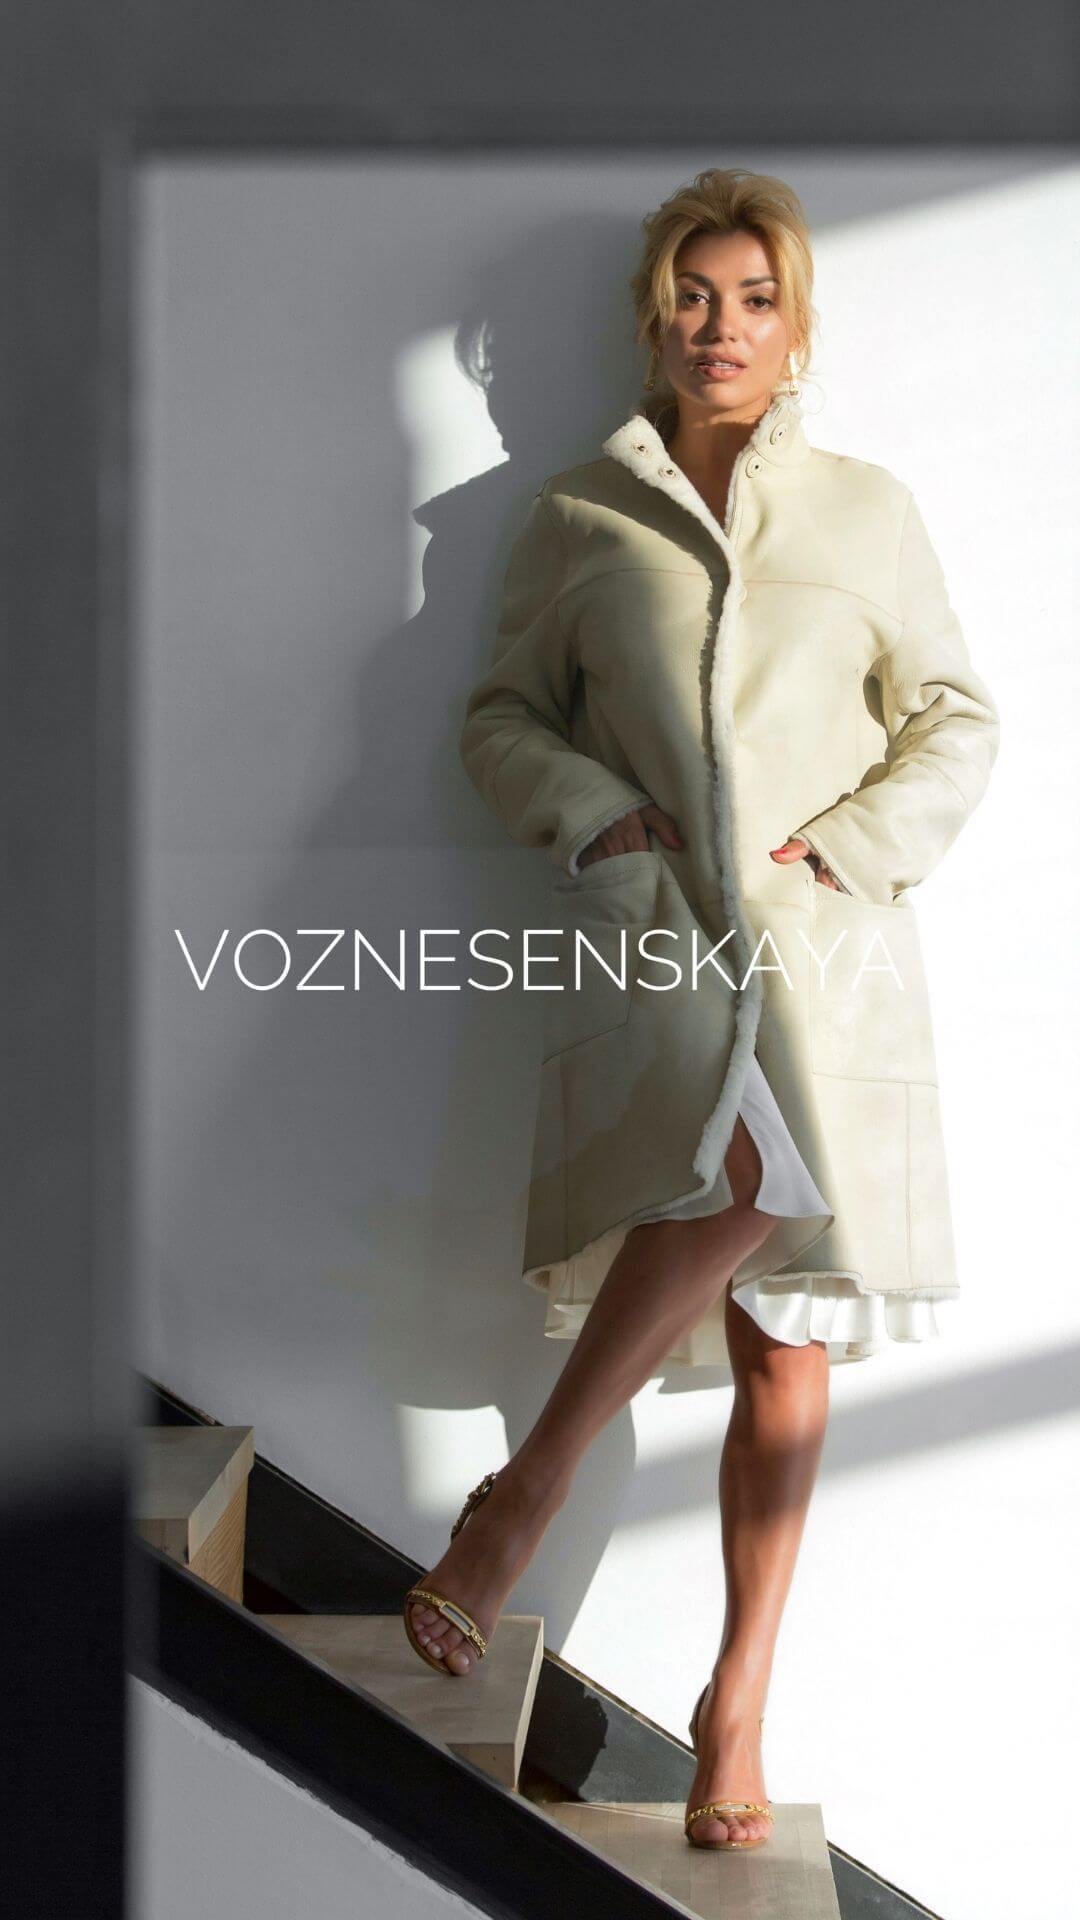 Sewing sheepskin coats Kiev